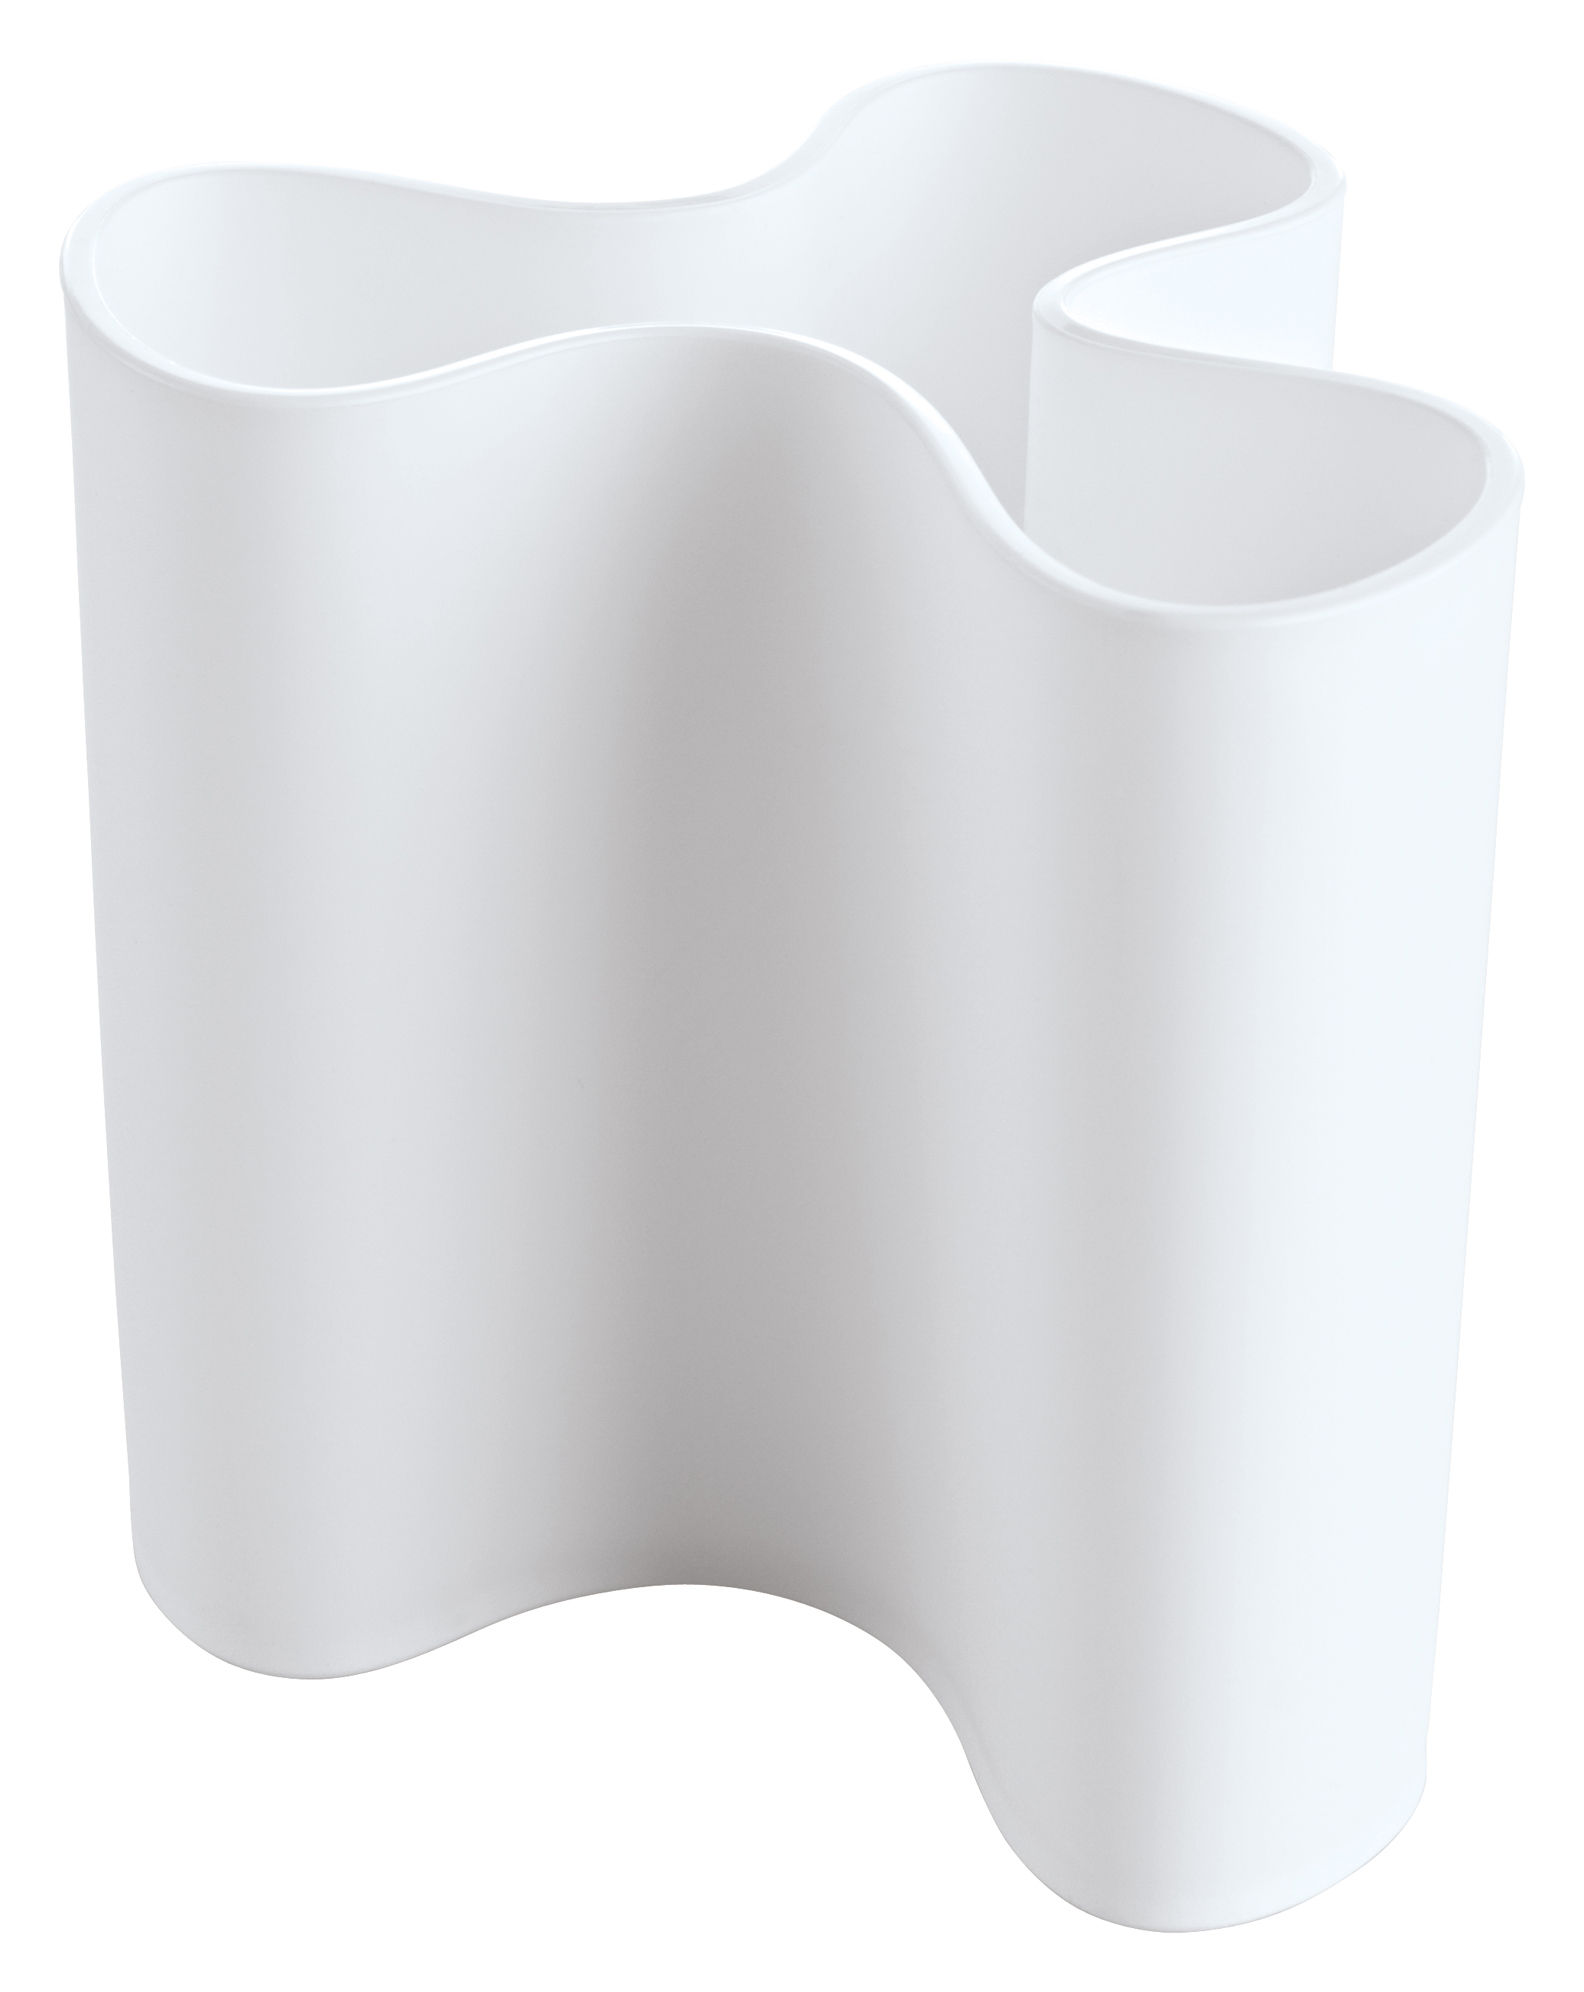 Dekoration - Vasen - Clara Vase - Koziol - Weiß - Plastikmaterial